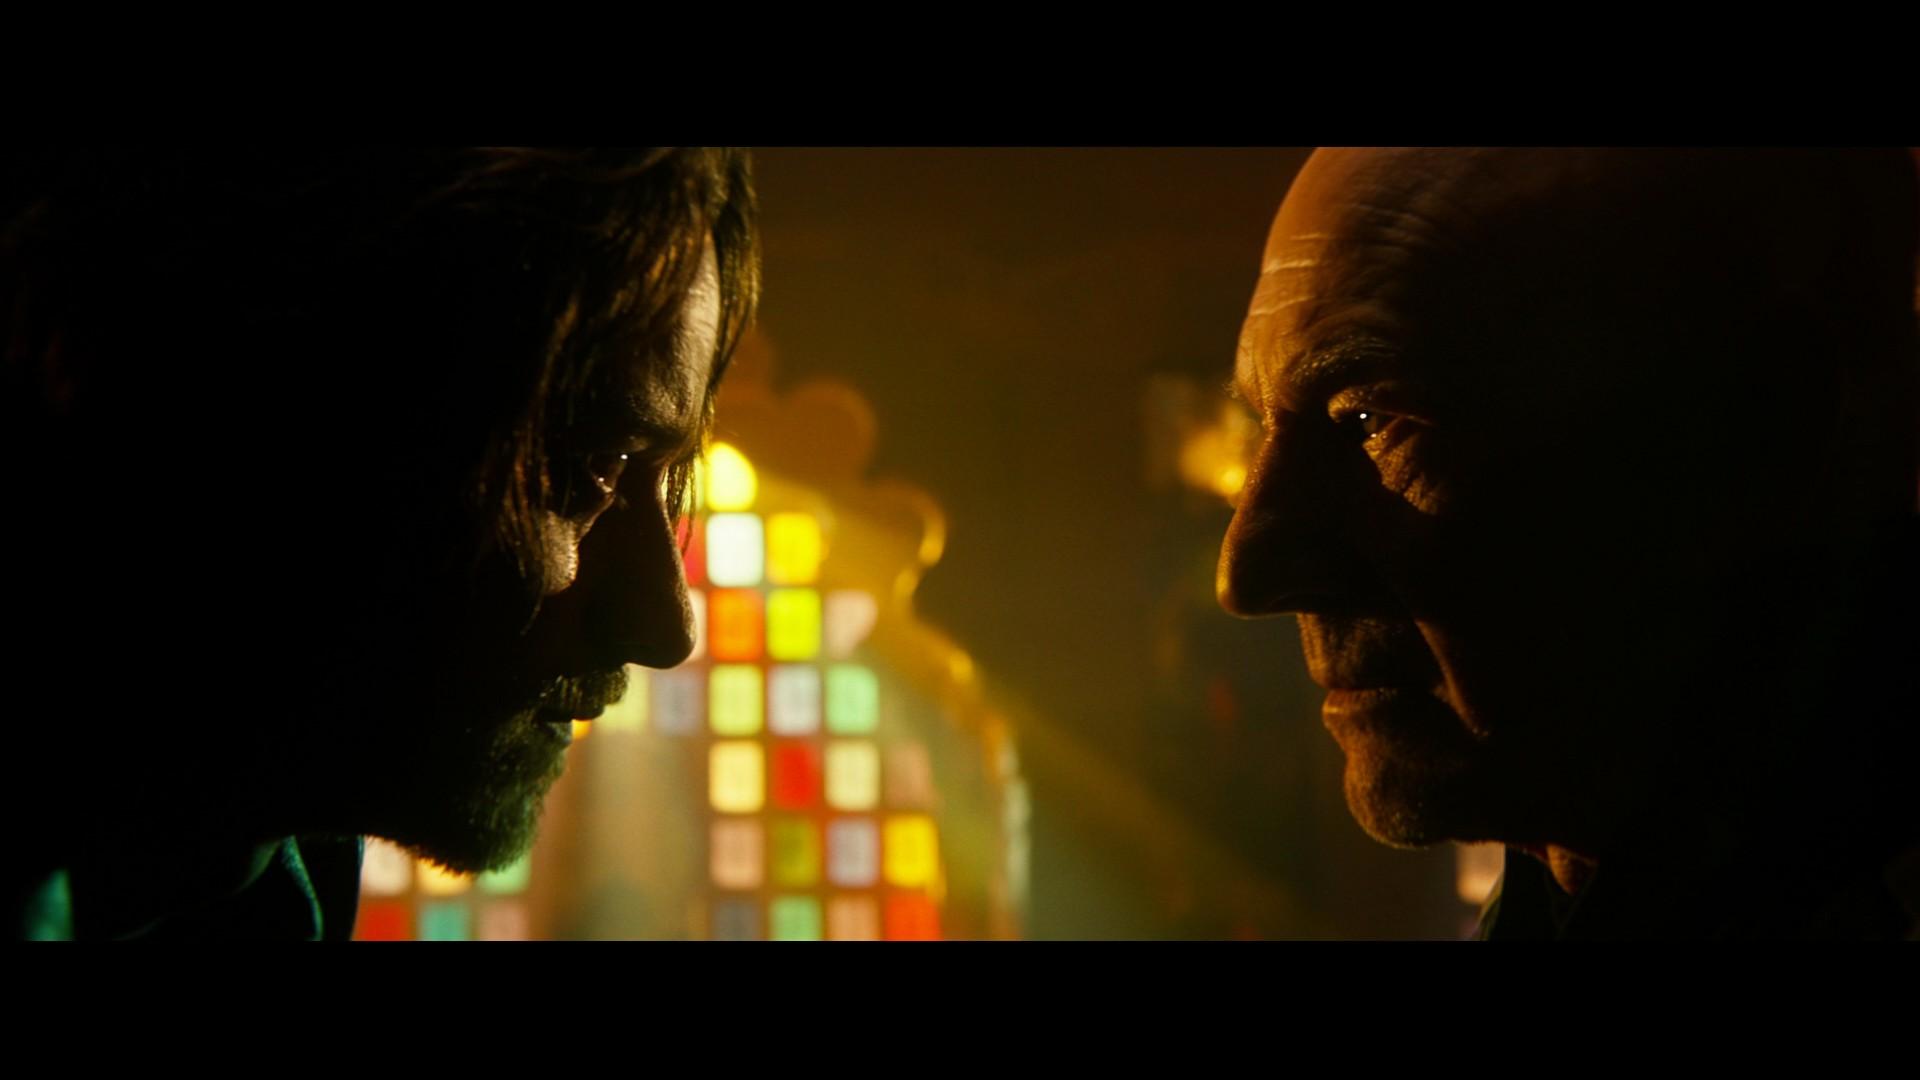 X-Men days of future past - Blu-ray